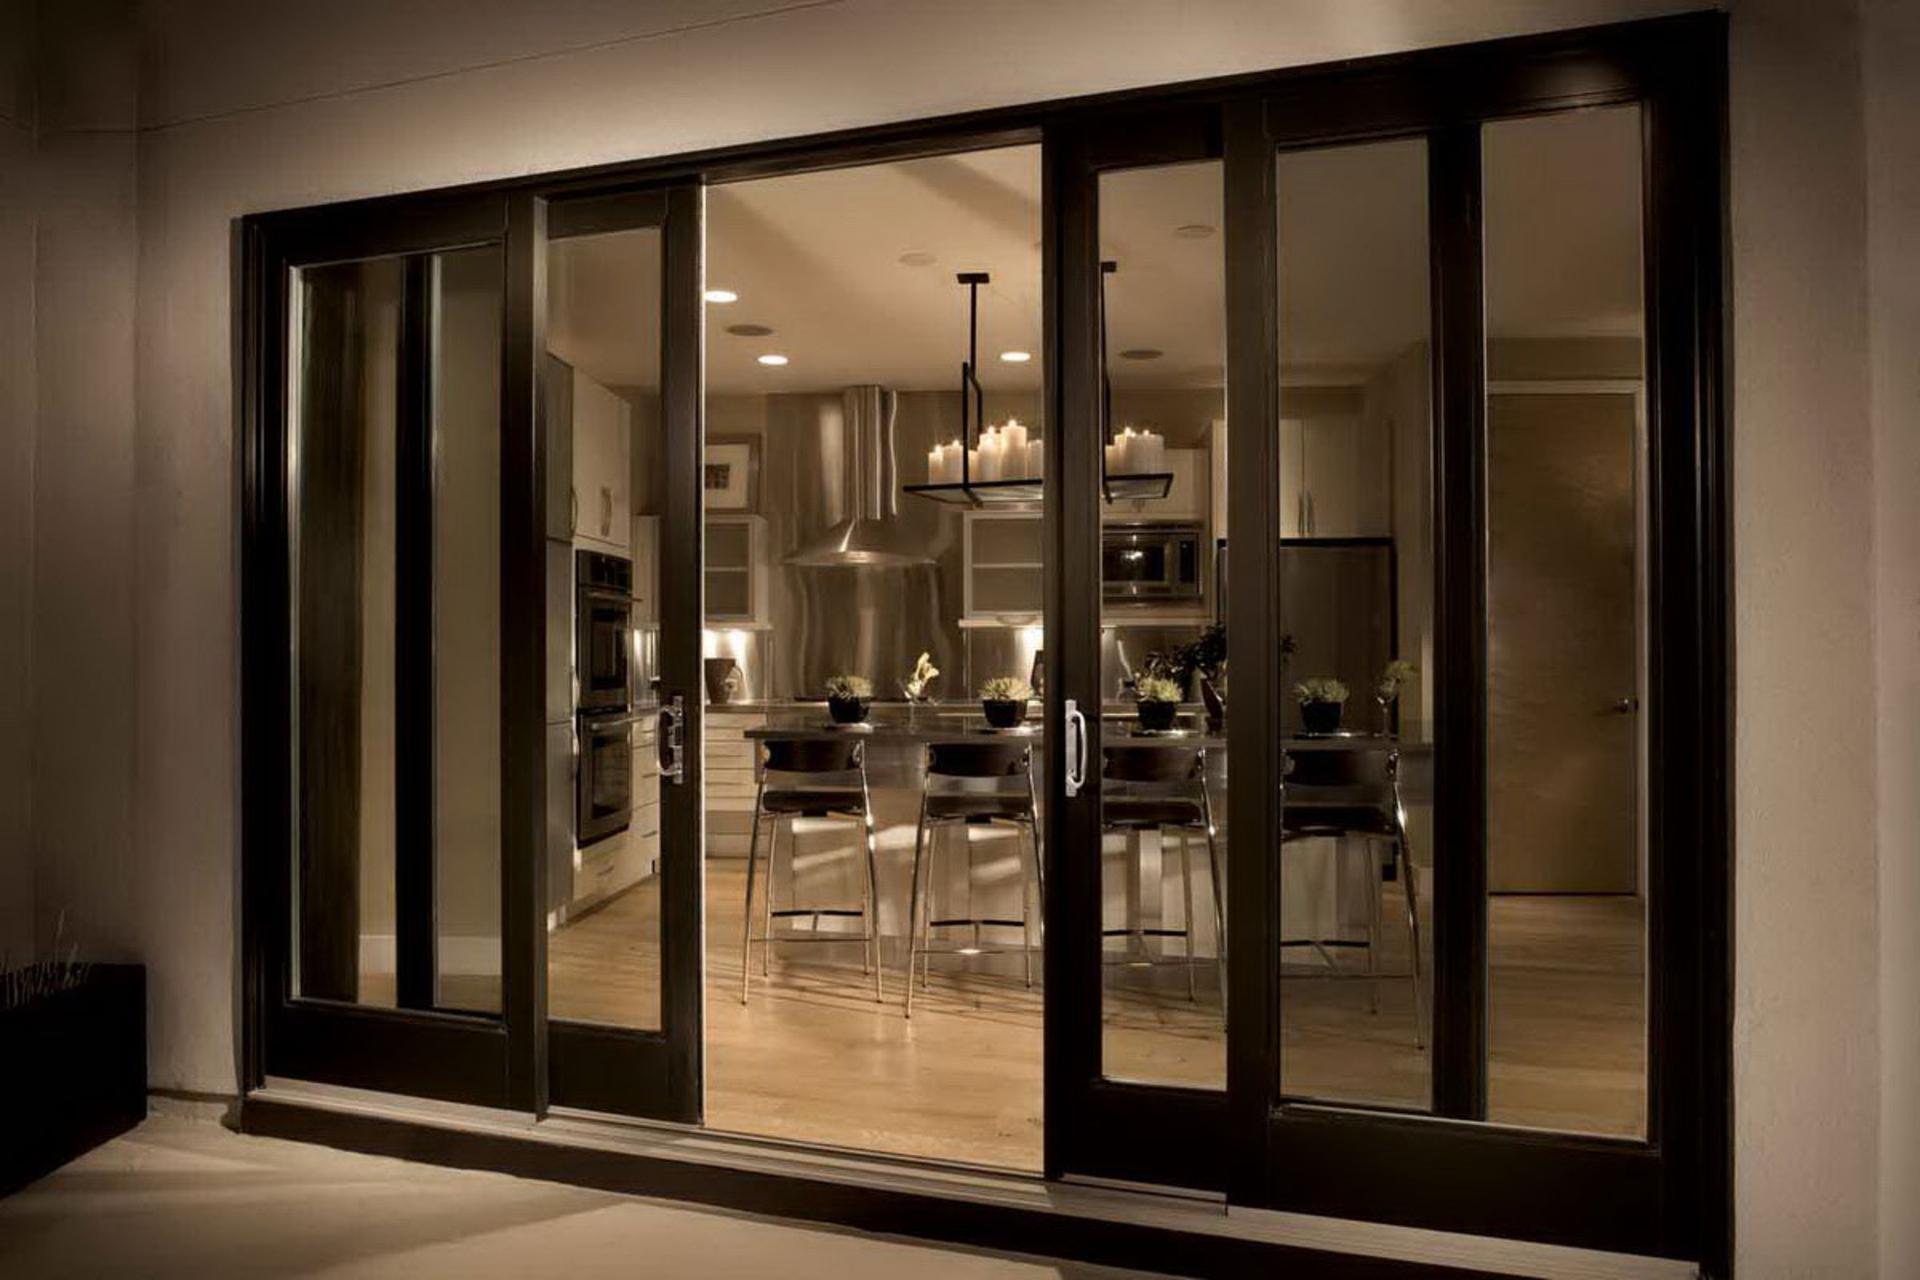 french-doors-interior-design-ideas-photo-15